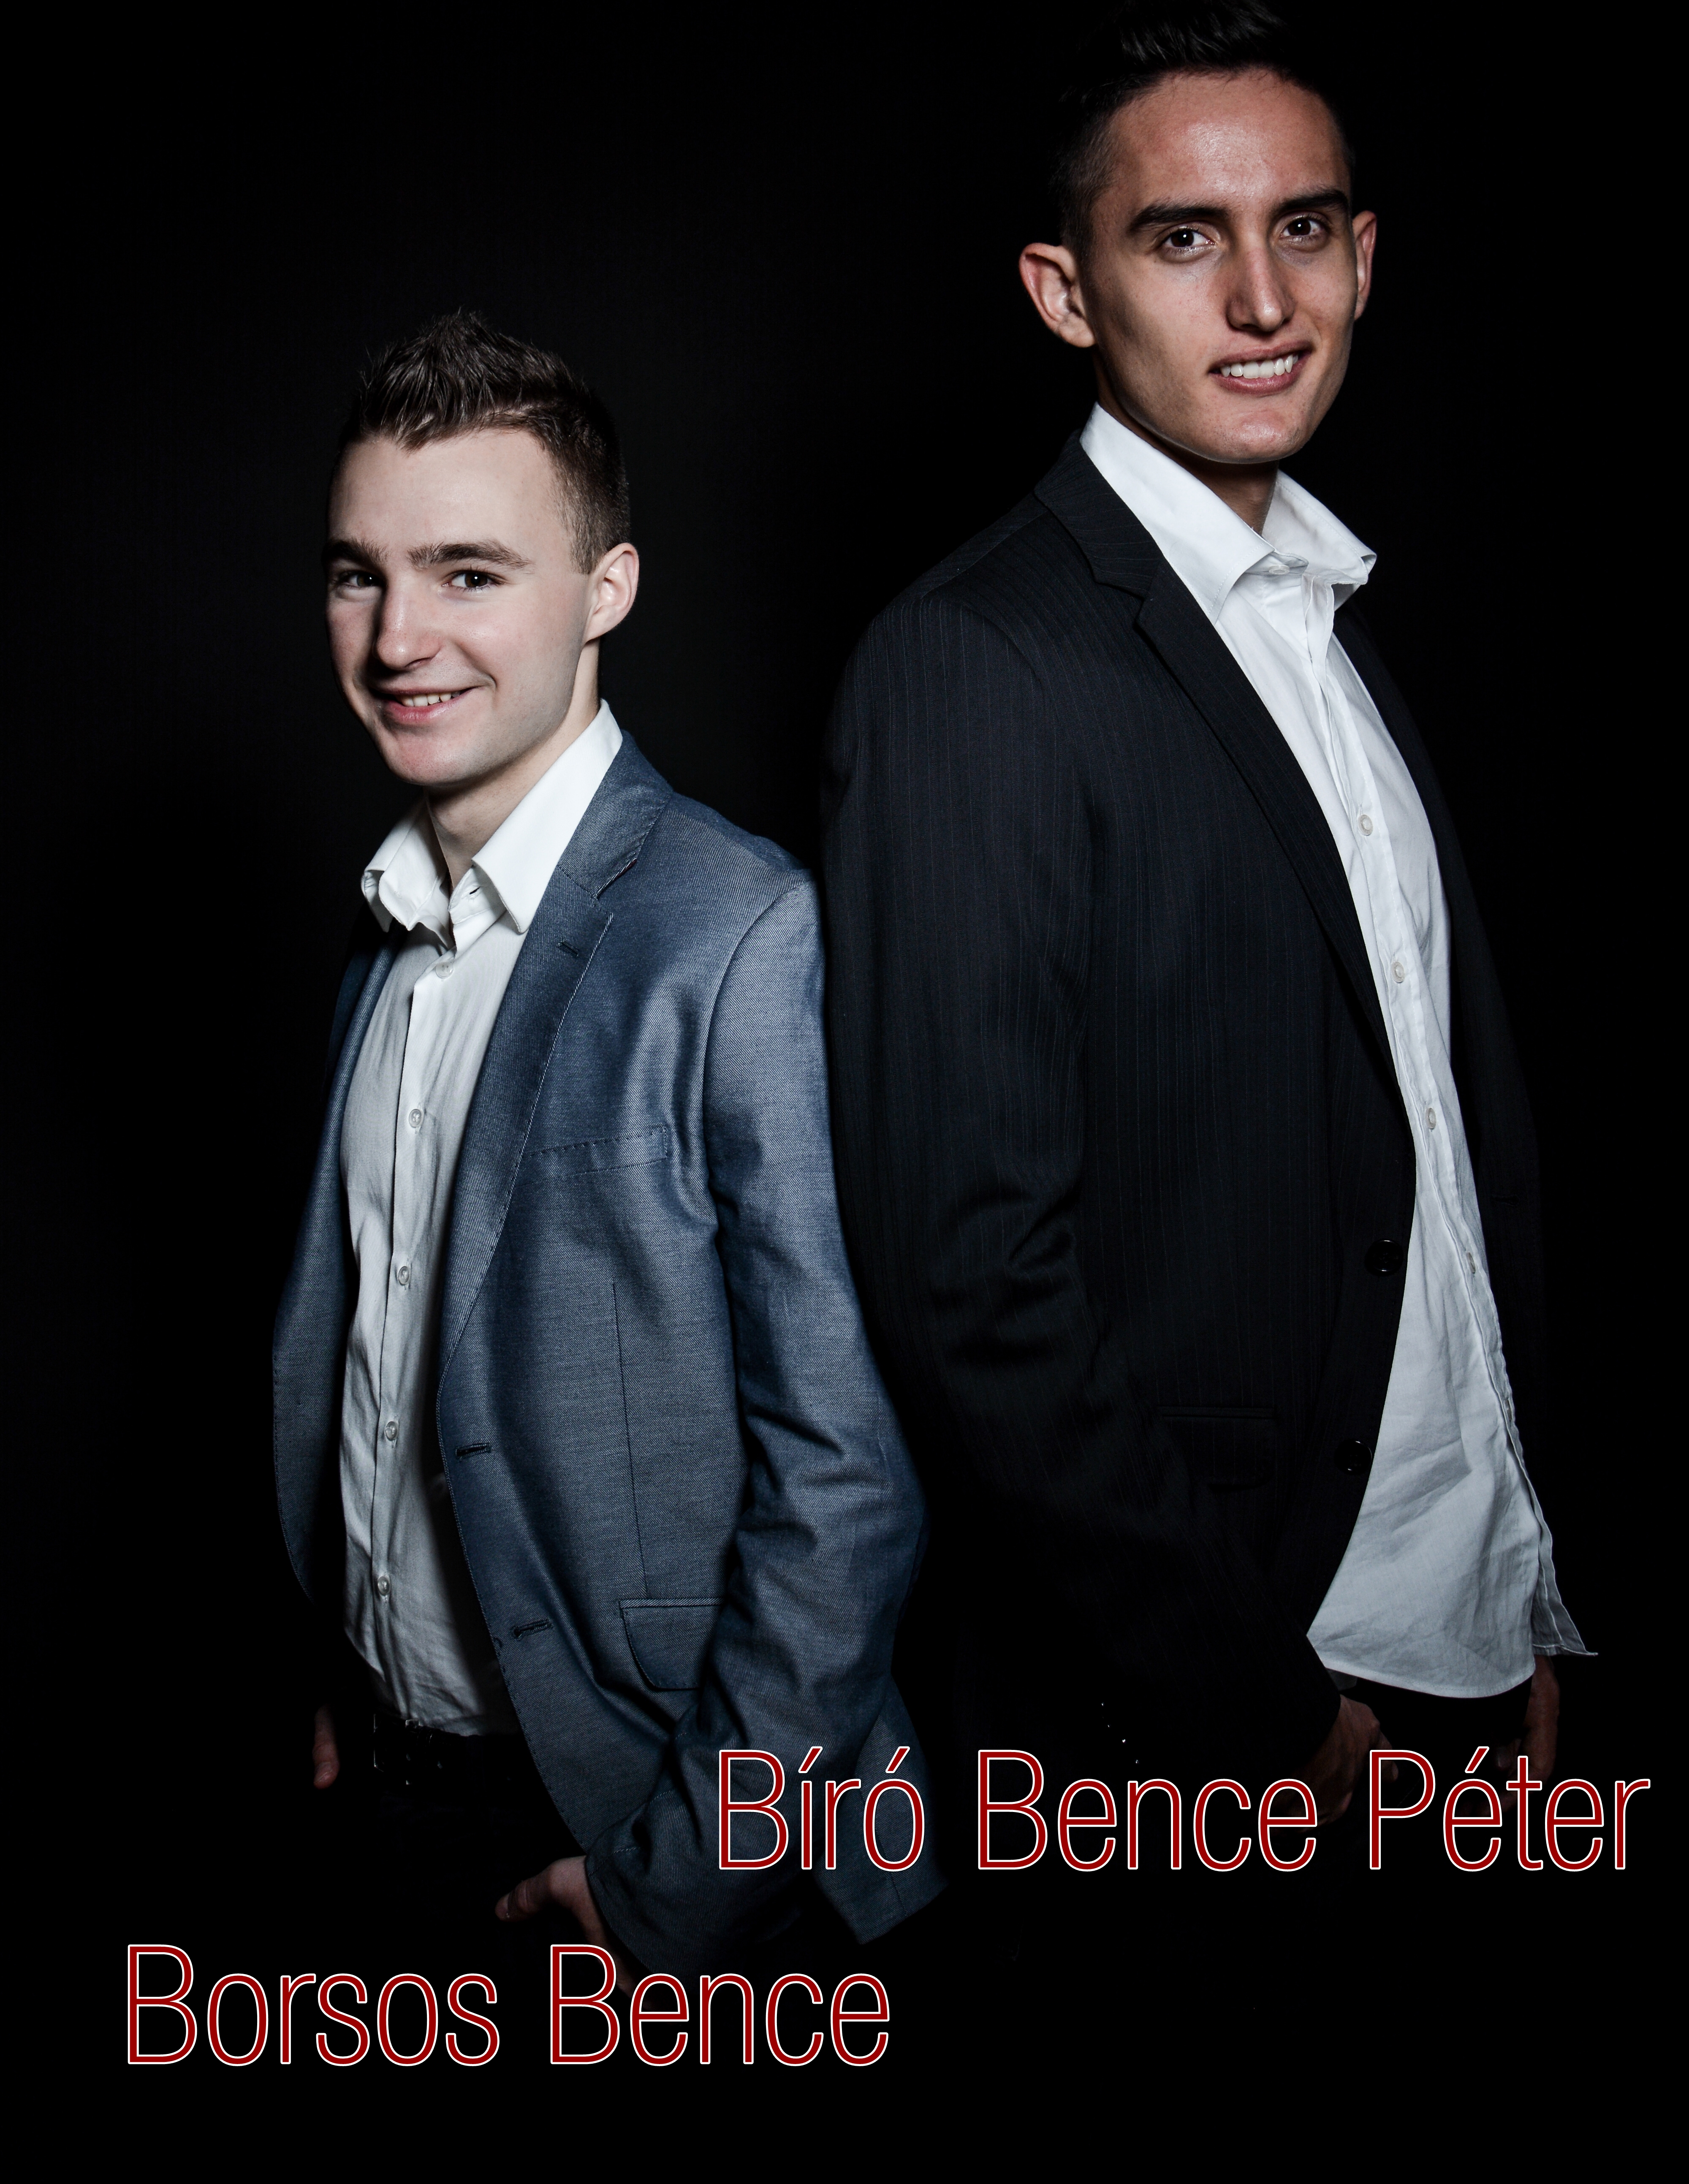 Borsos Bence és Bíró Bence Péter